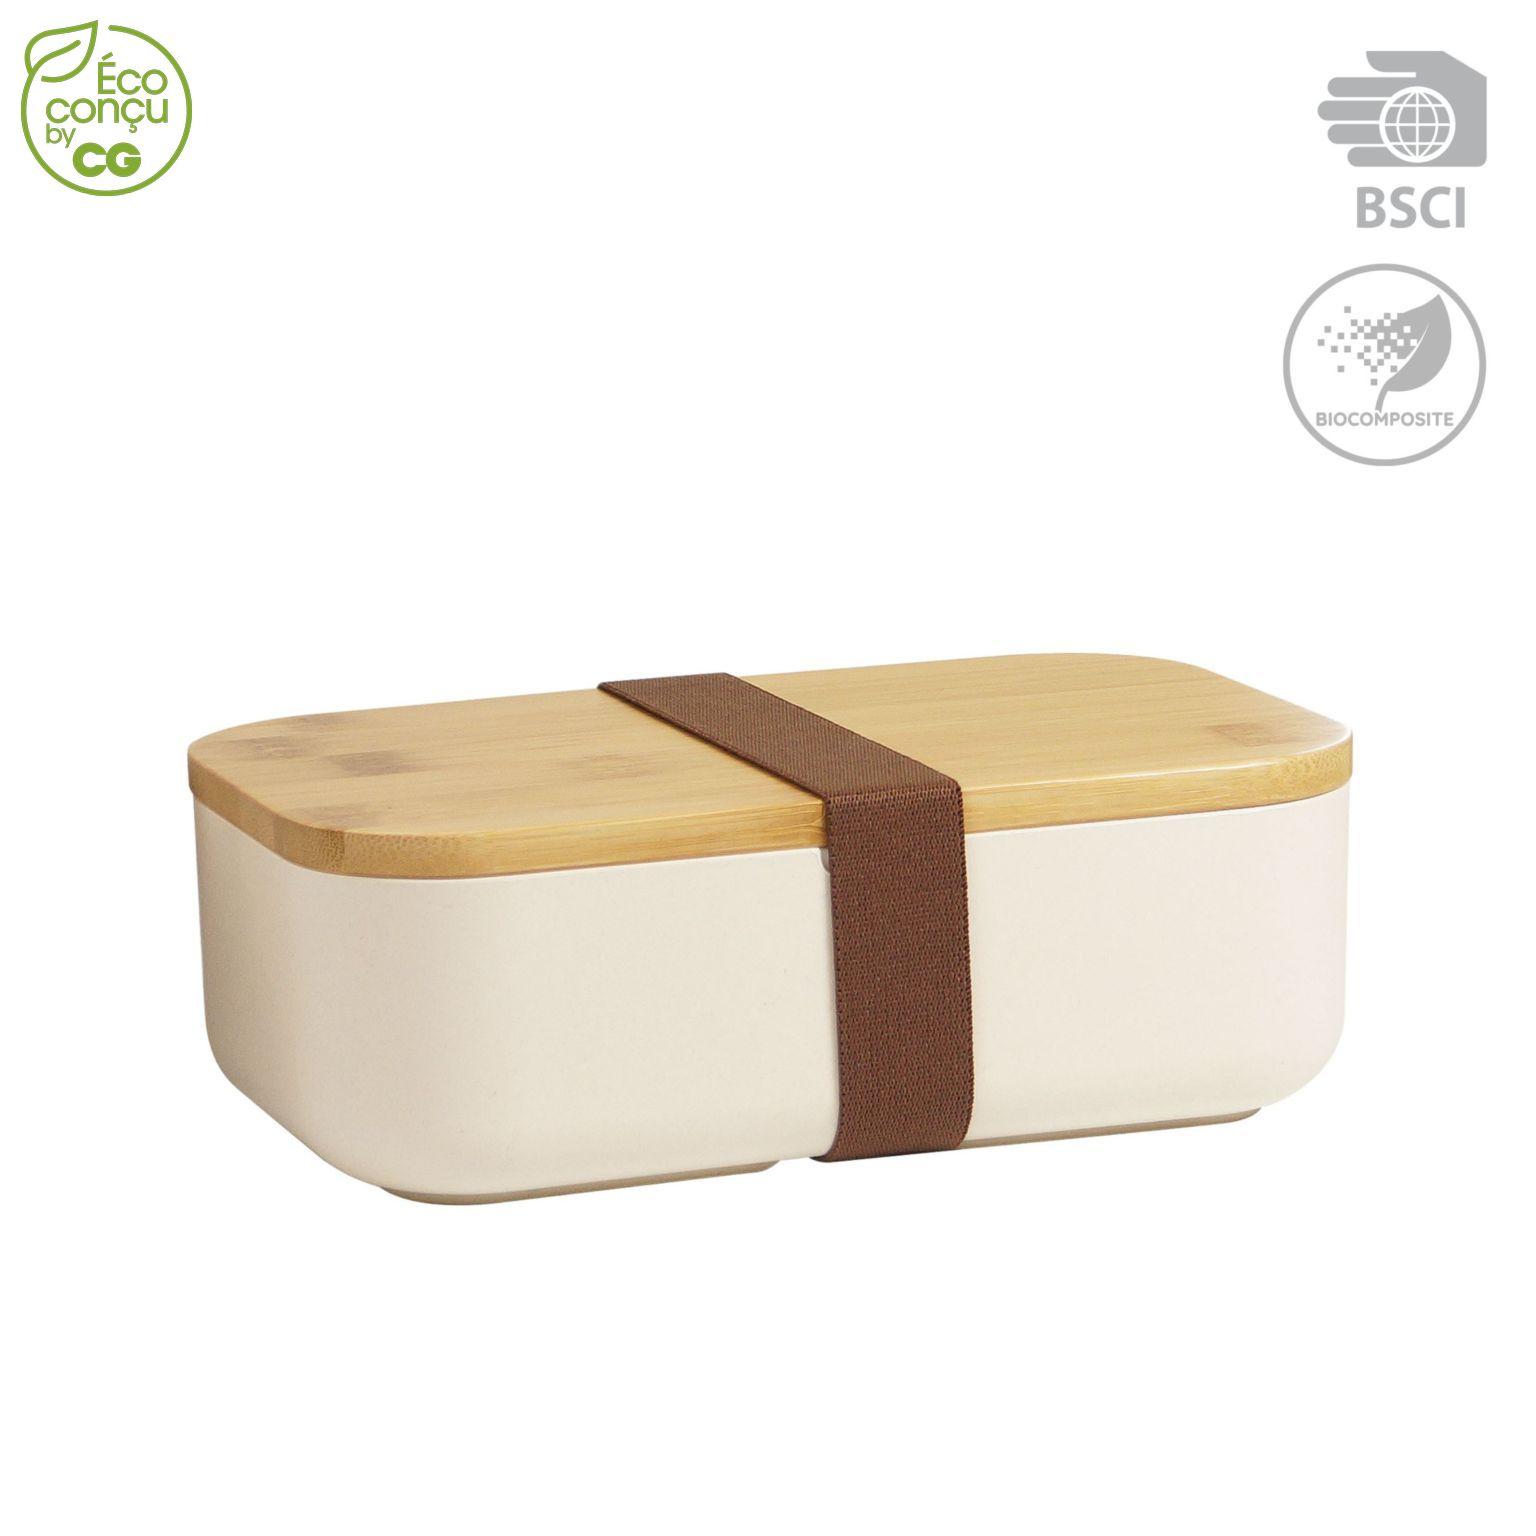 BOXYBOO lunch box